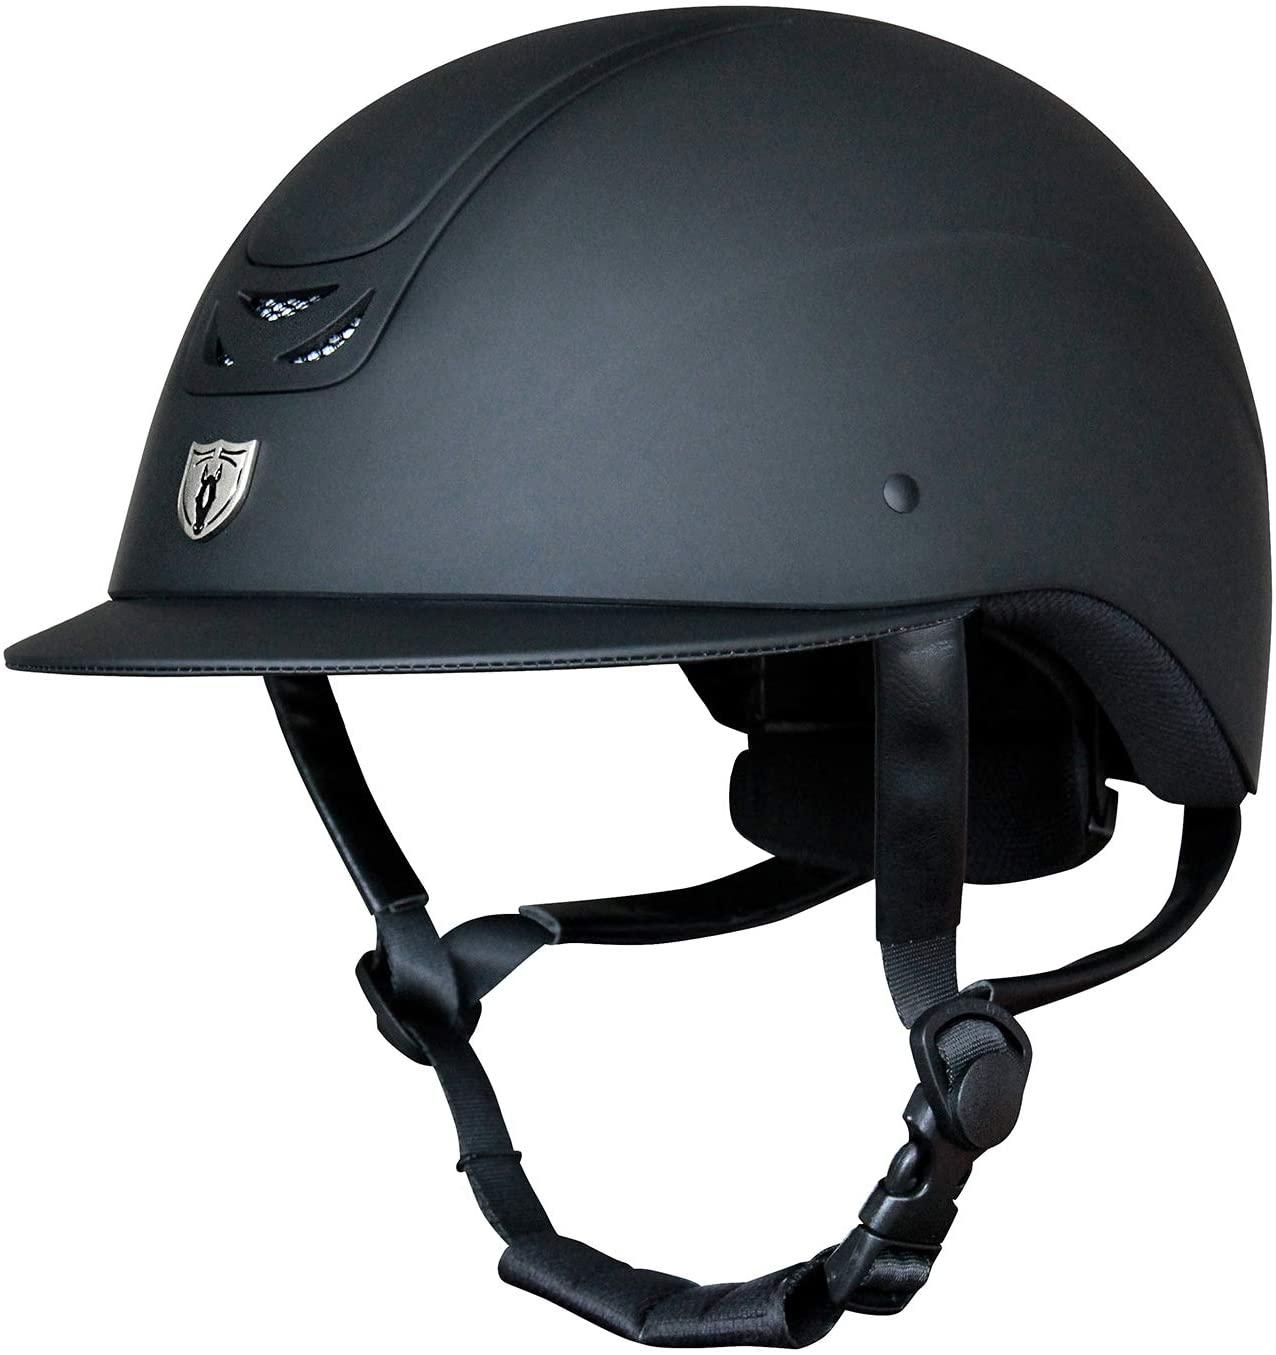 Tipperary Royal Helmet